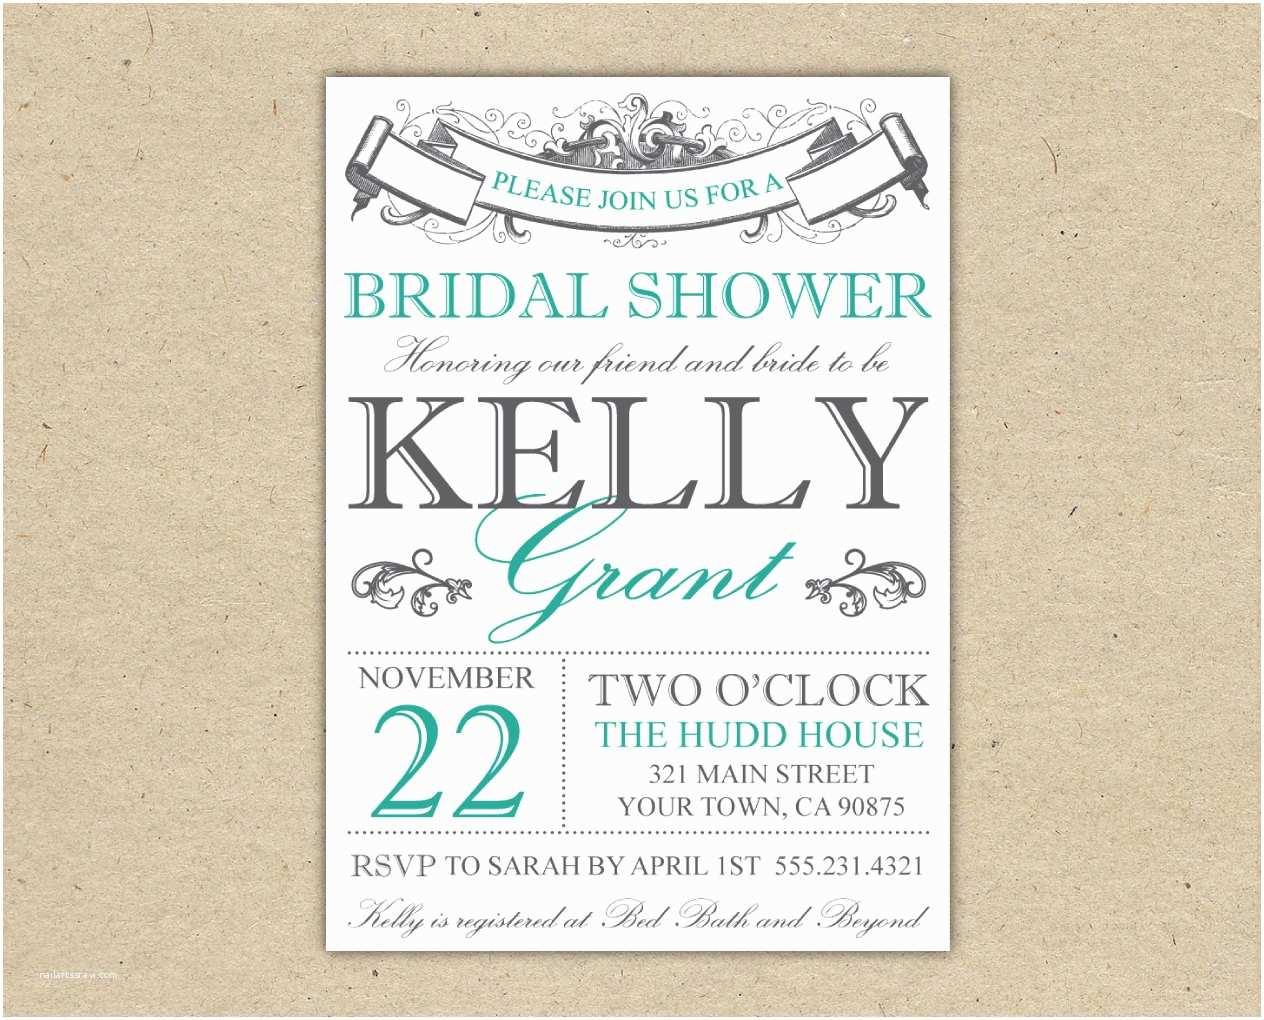 Bridal Shower Invitation Templates Bridal Shower Invitation Templates